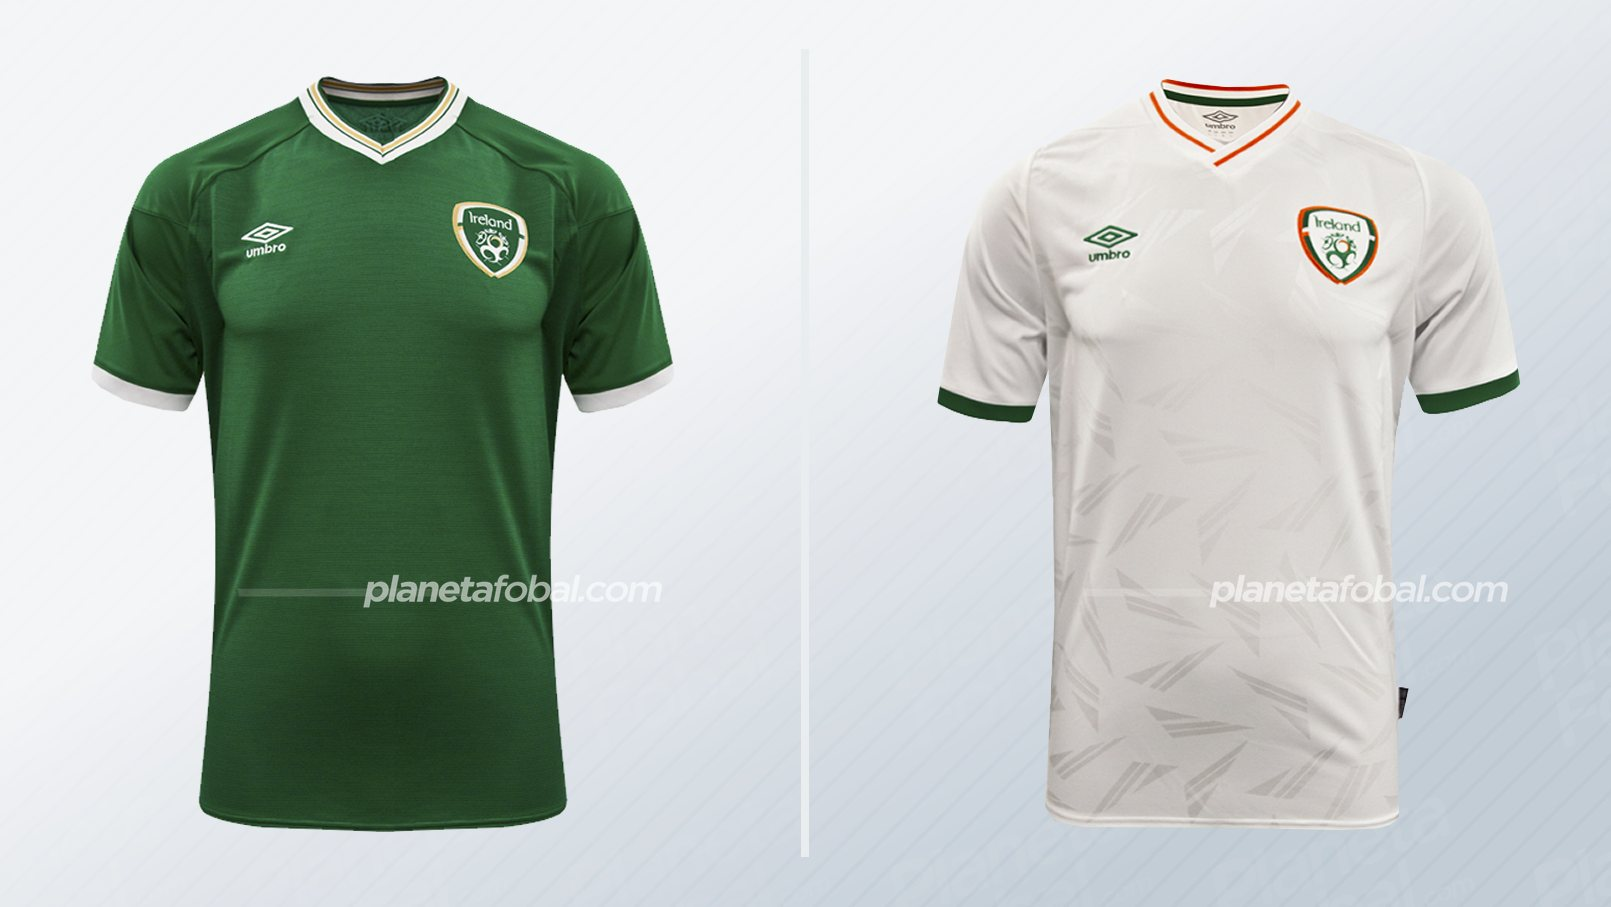 Camisetas Umbro de Irlanda (Masculinas) 2020/2021   Imagen FAI